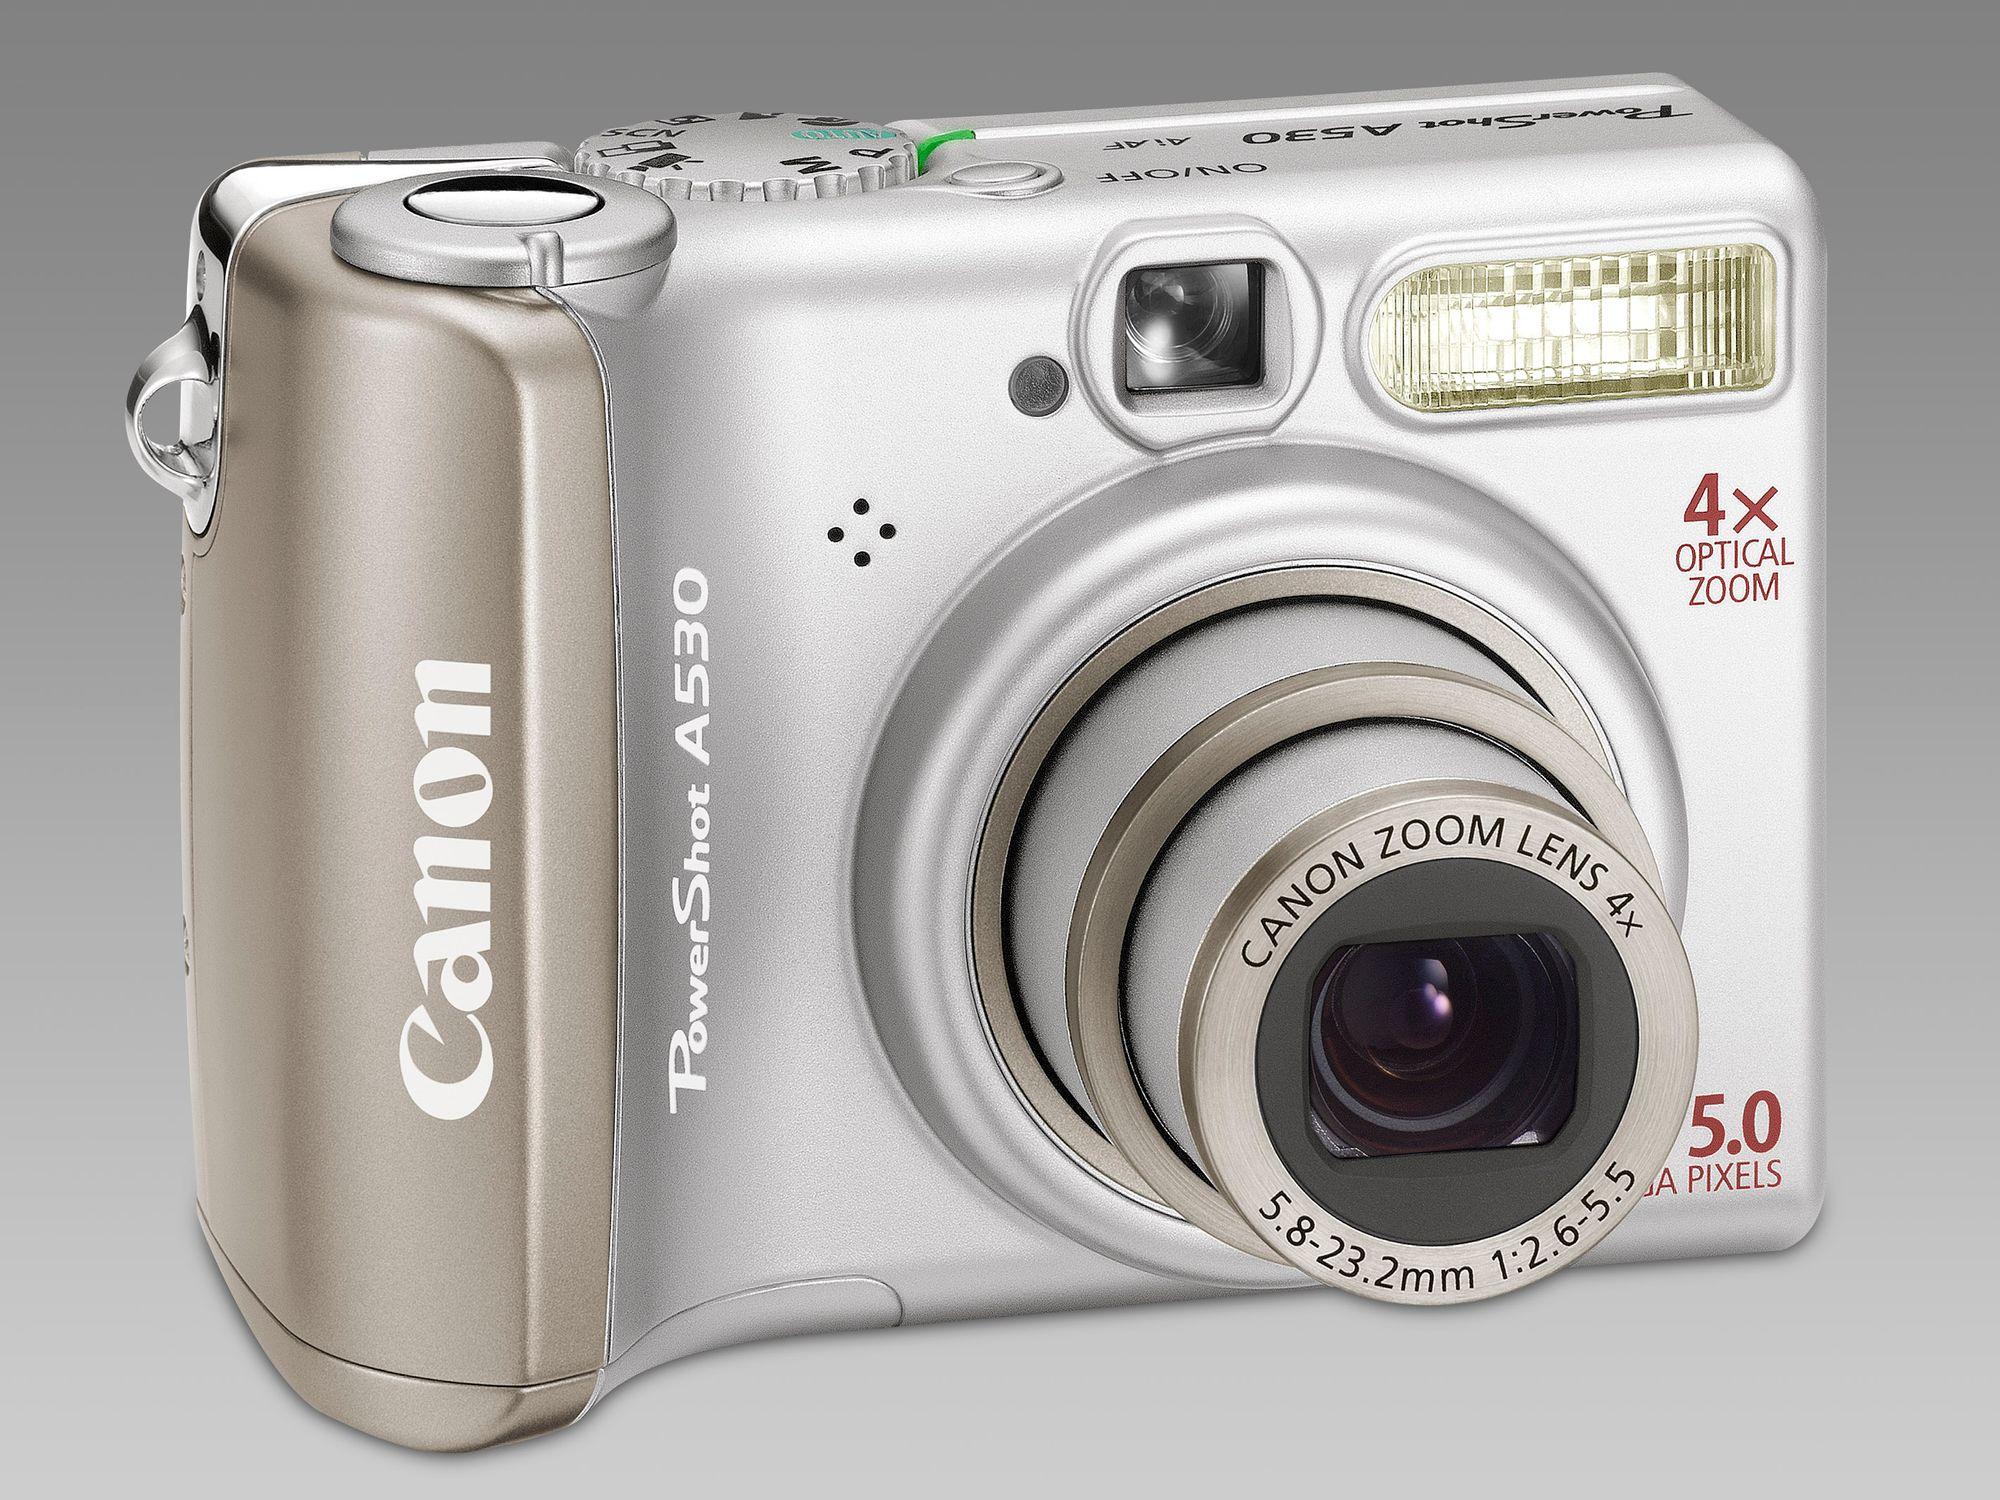 Canon Powershot A540 Инструкция